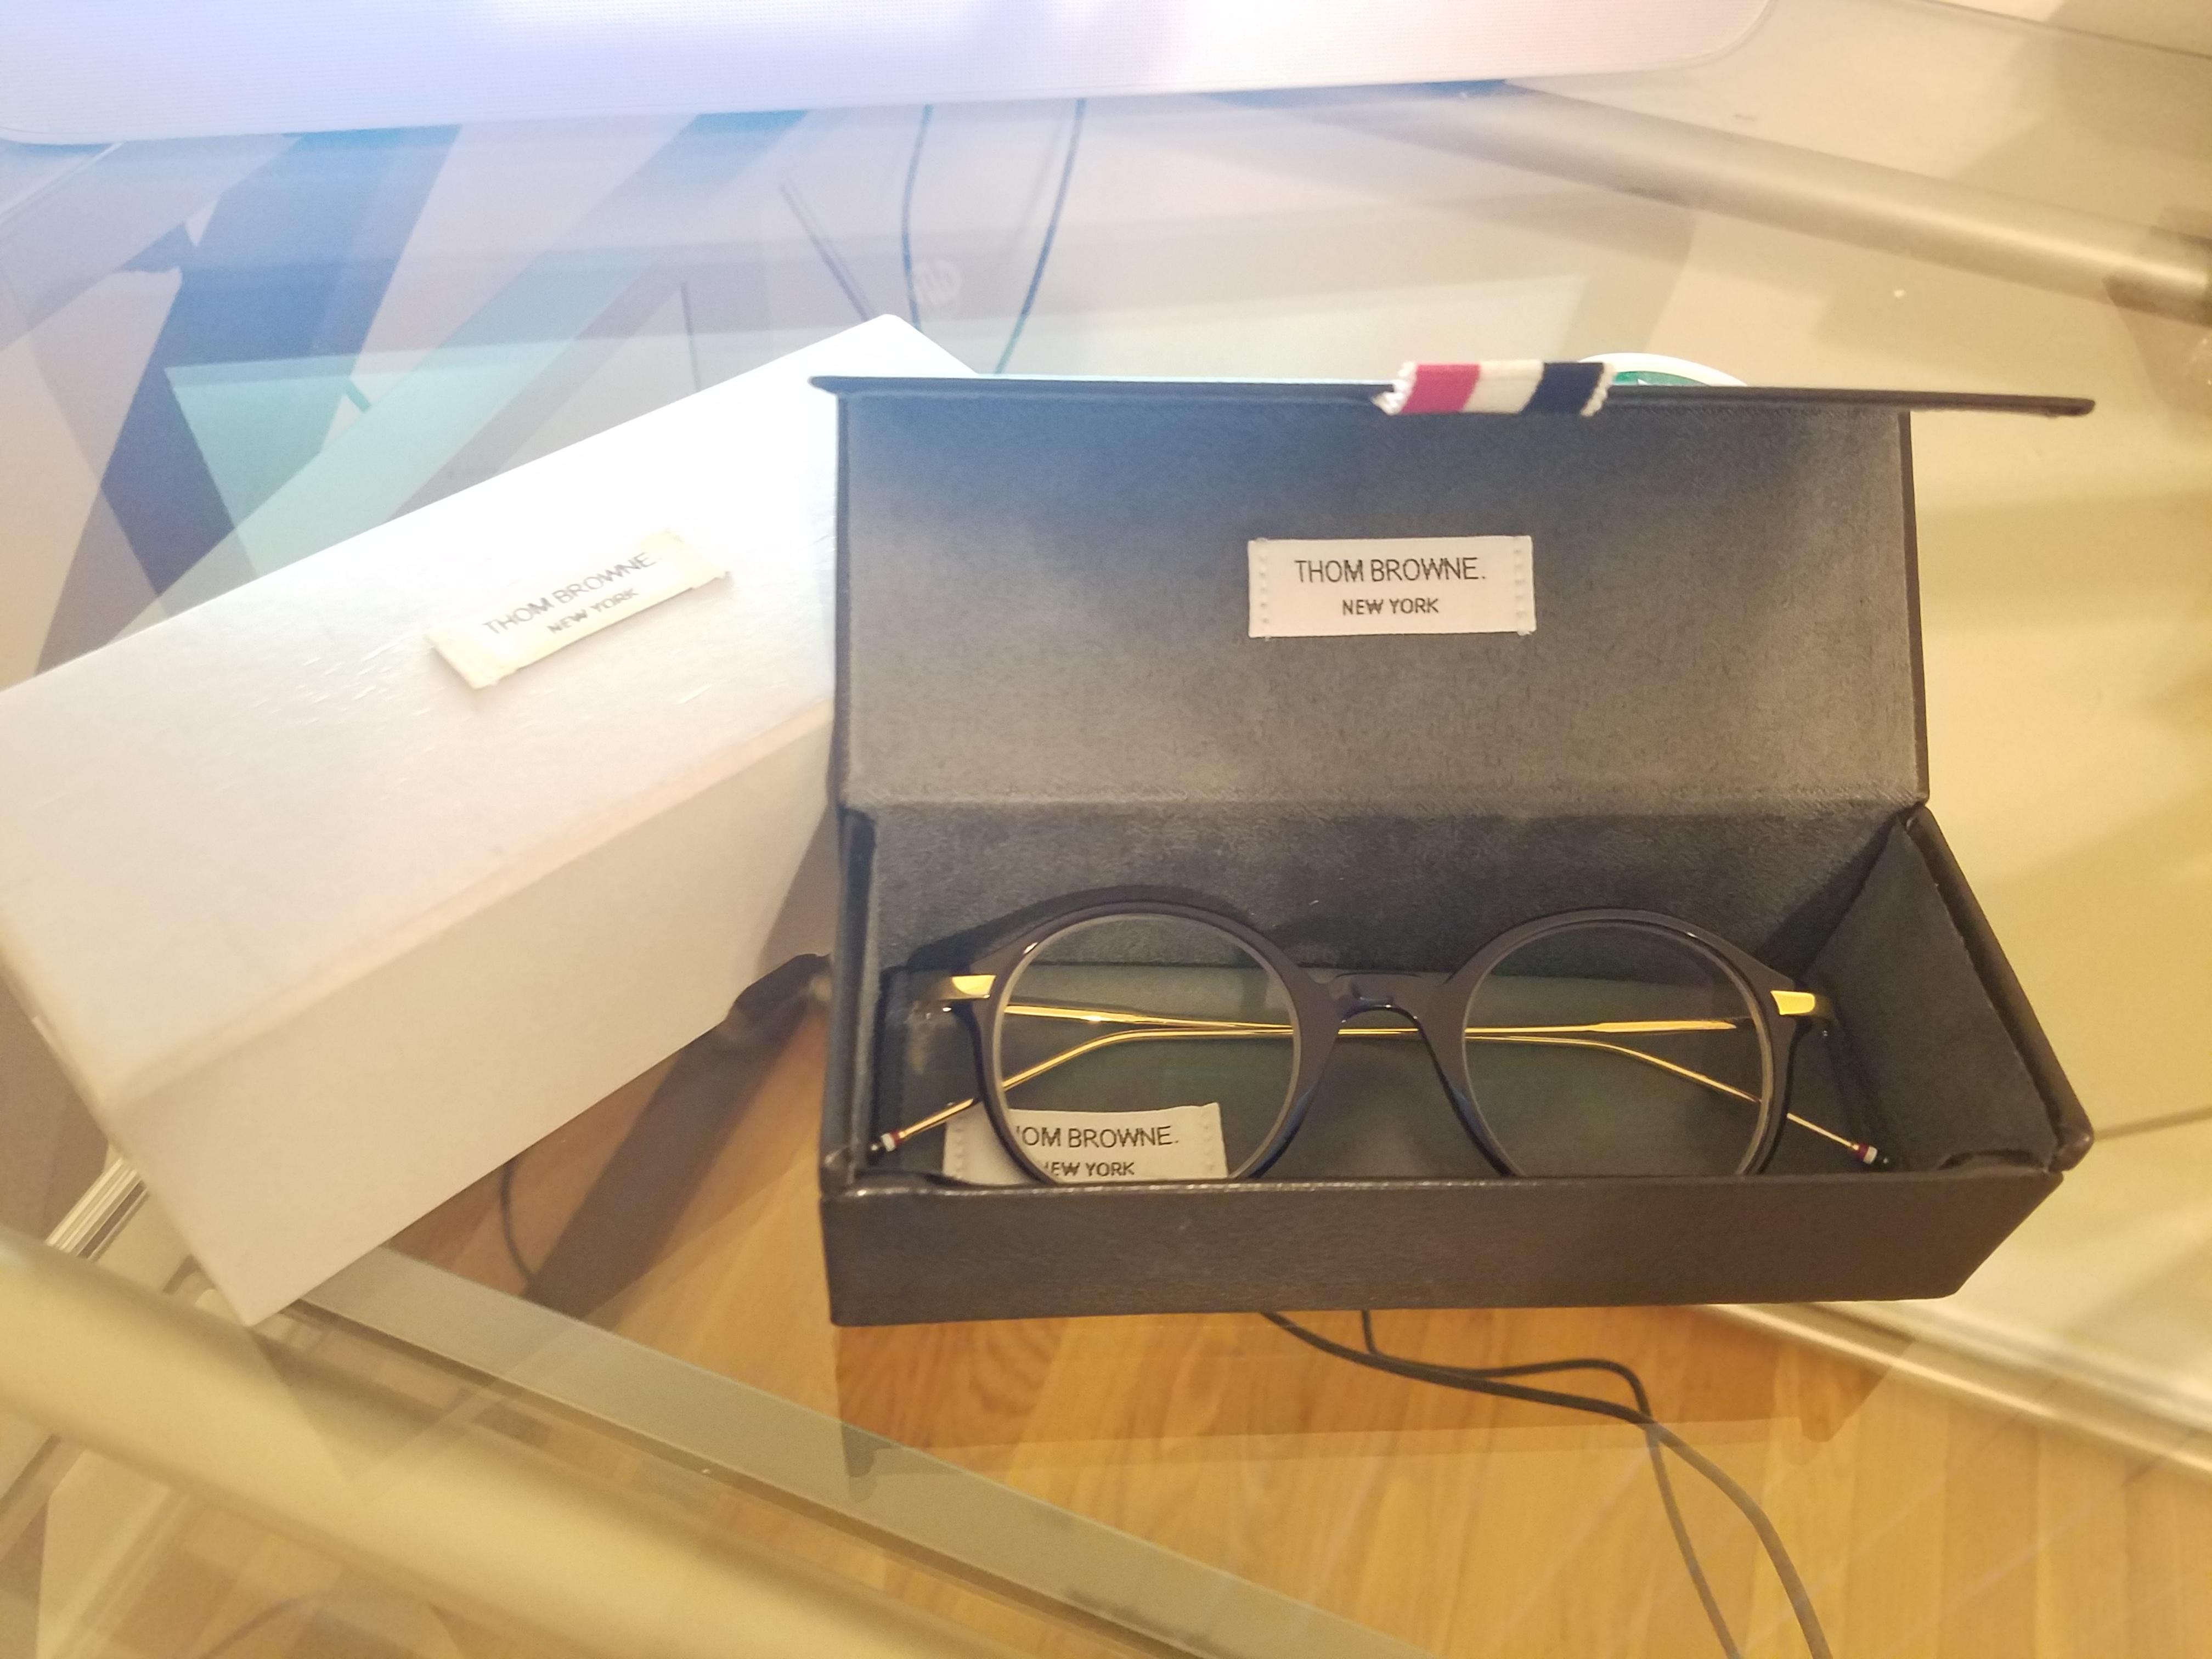 02c1793a5c8 Thom Browne Thom Browne Glasses